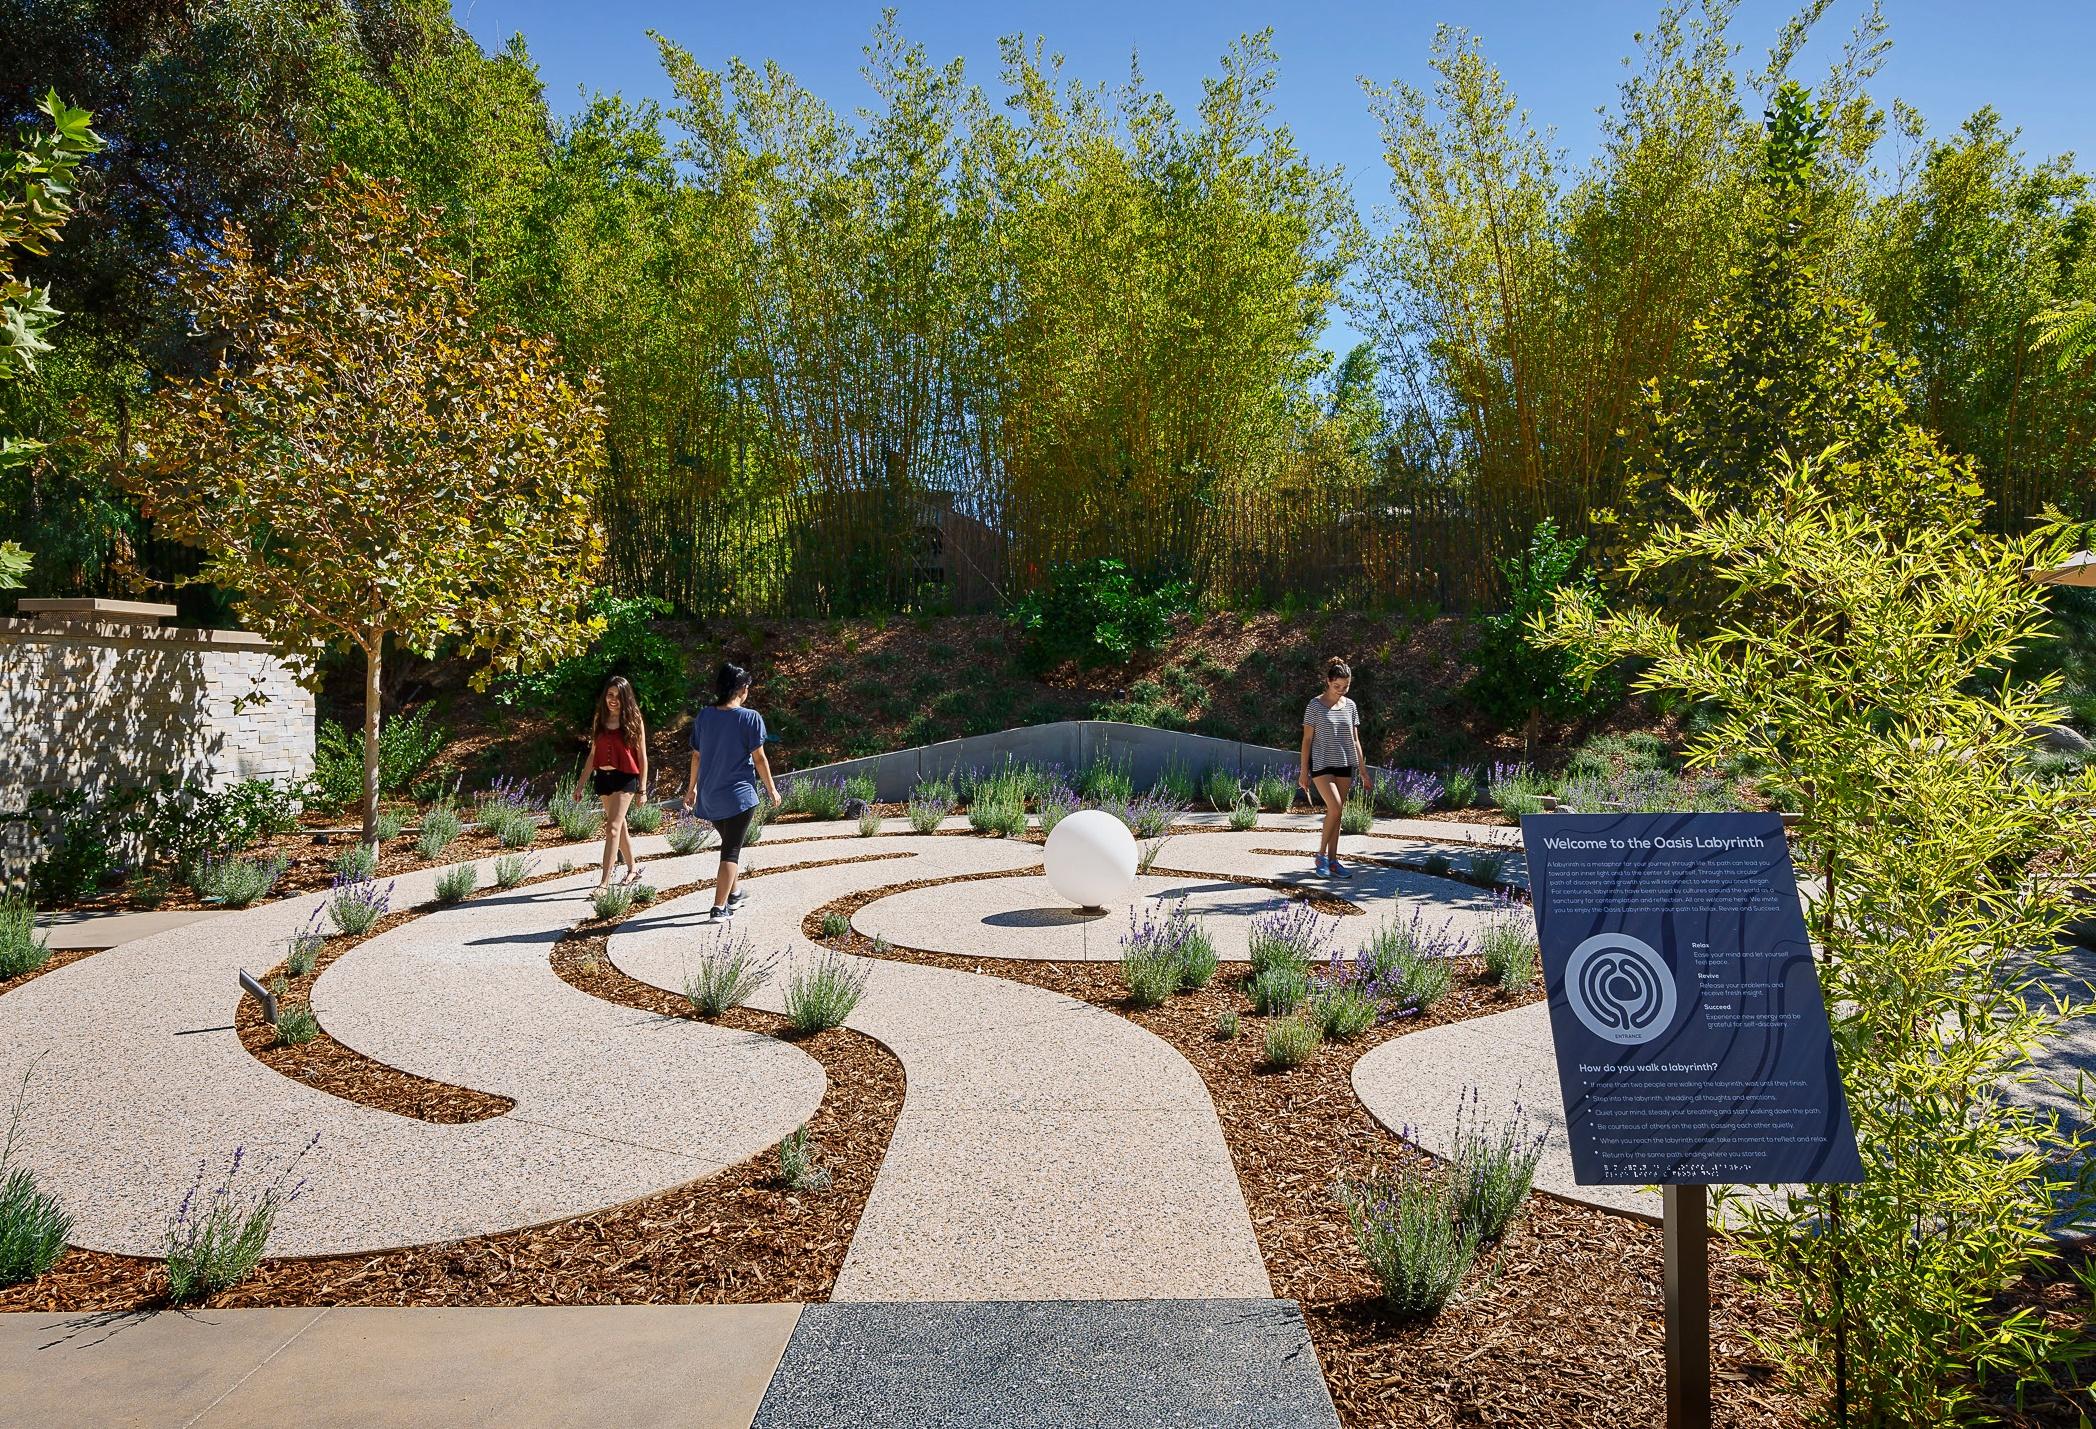 Oasis-Wellness-Center-Labyrinth-.jpg